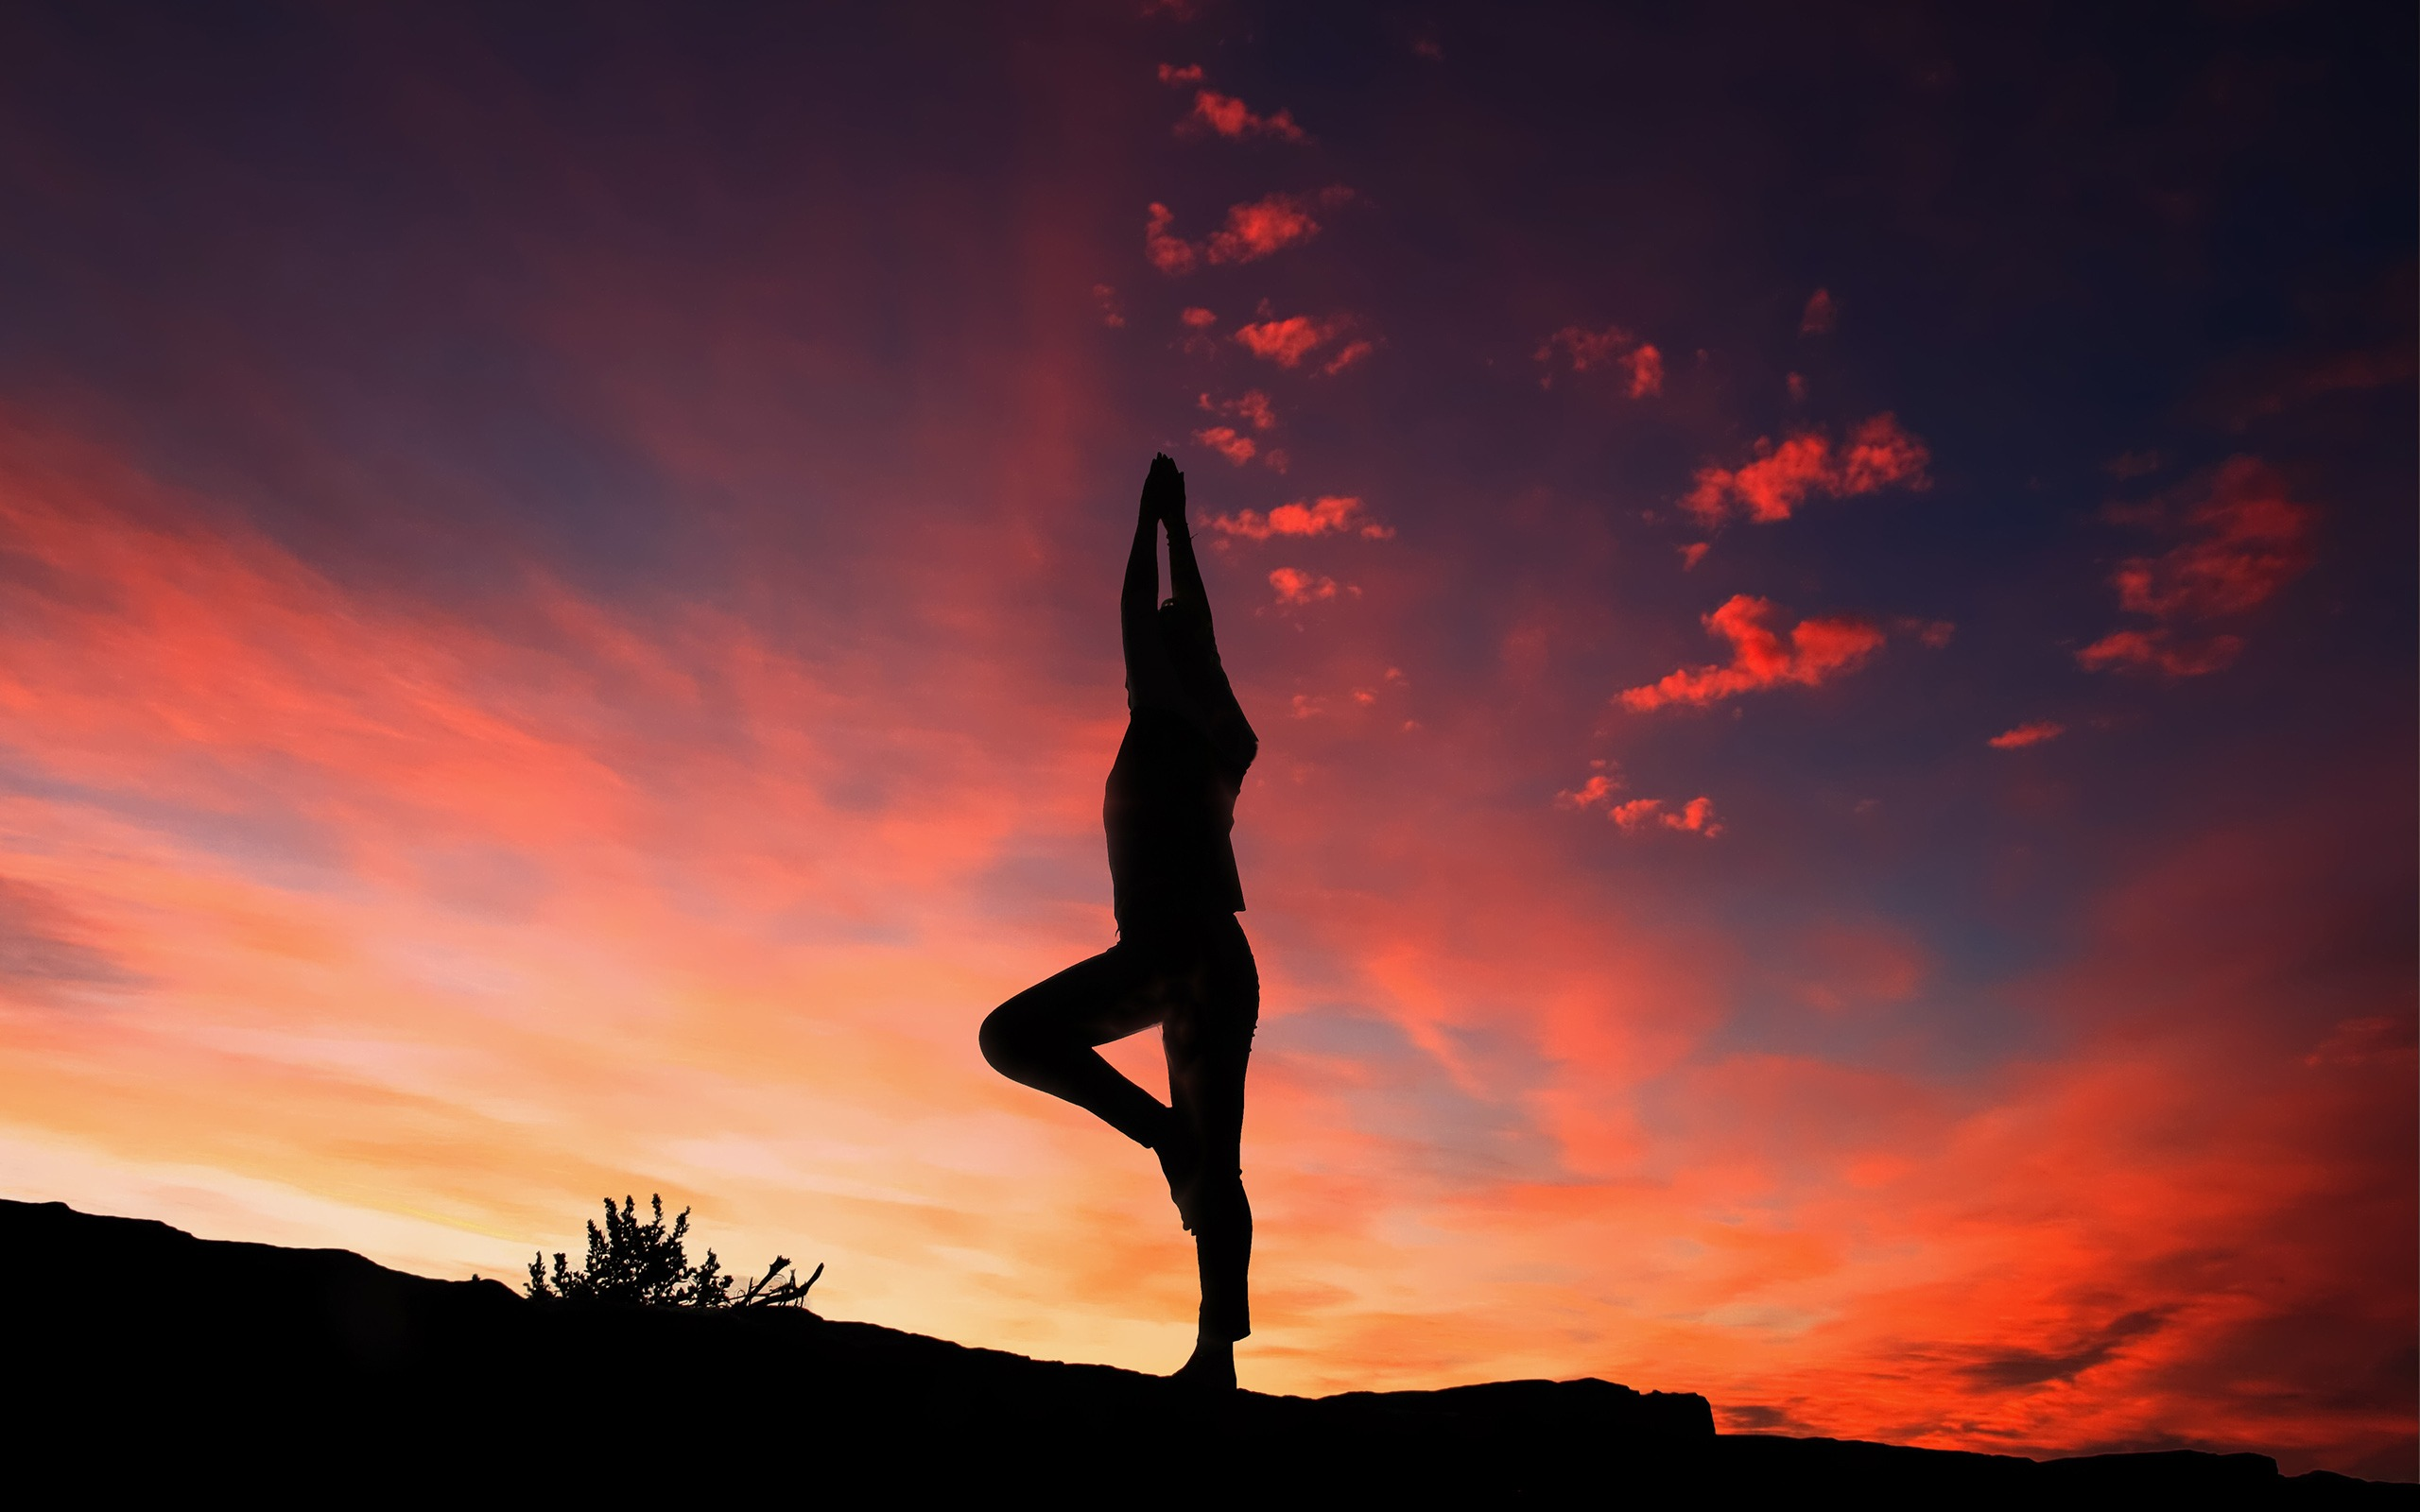 Sunset Yoga Silhouette High Quality Wallpaper Preview 10wallpaper Com